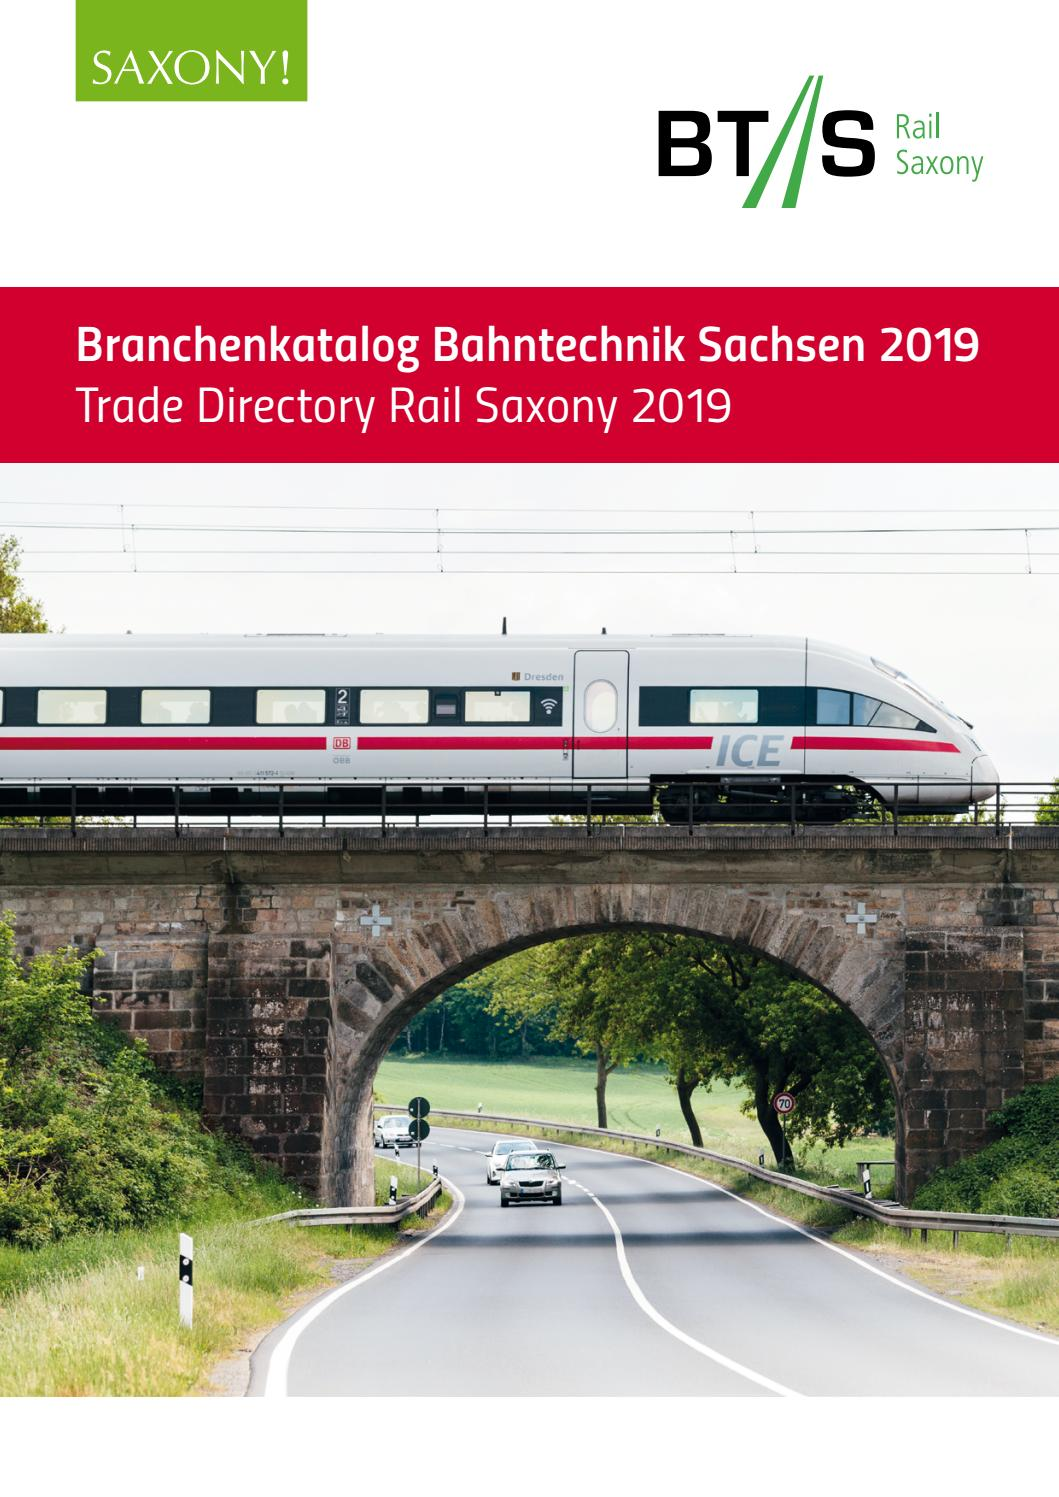 Bts Branchenkatalog Bahntechnik In Sachsen 2019 Trade